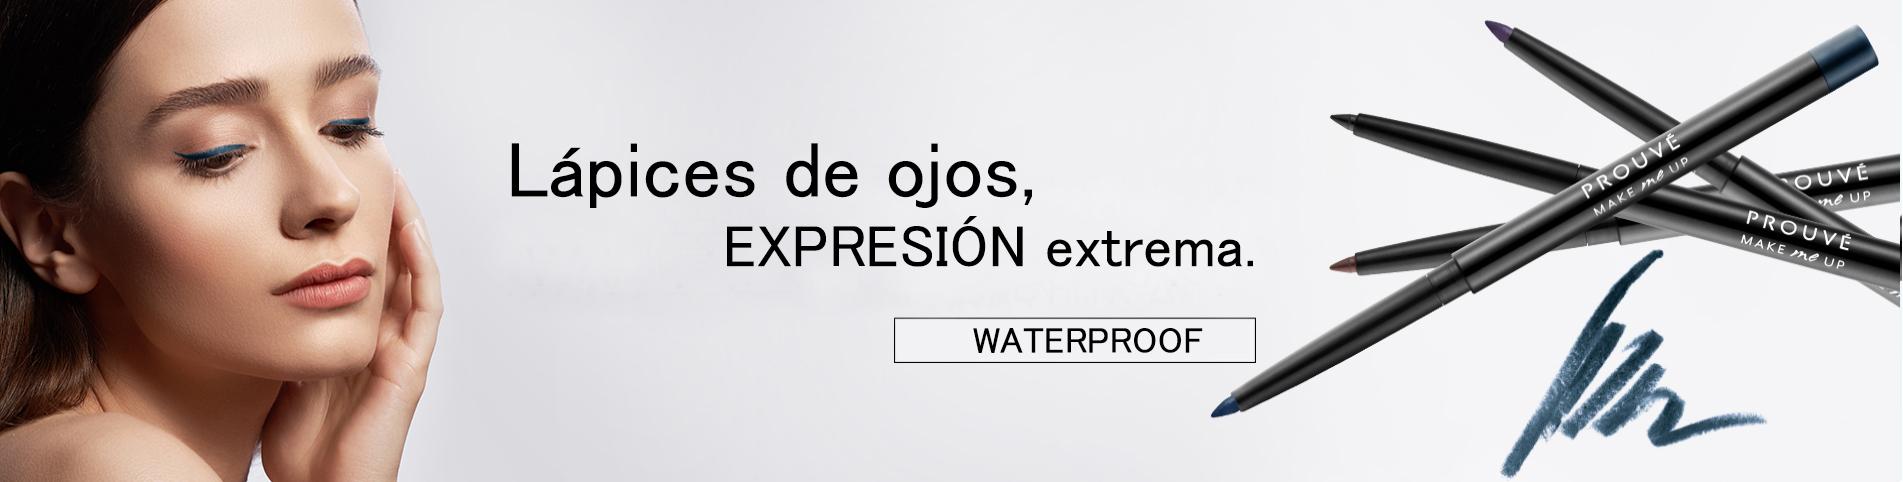 lápices de ojos resistentes al agua, prouvé